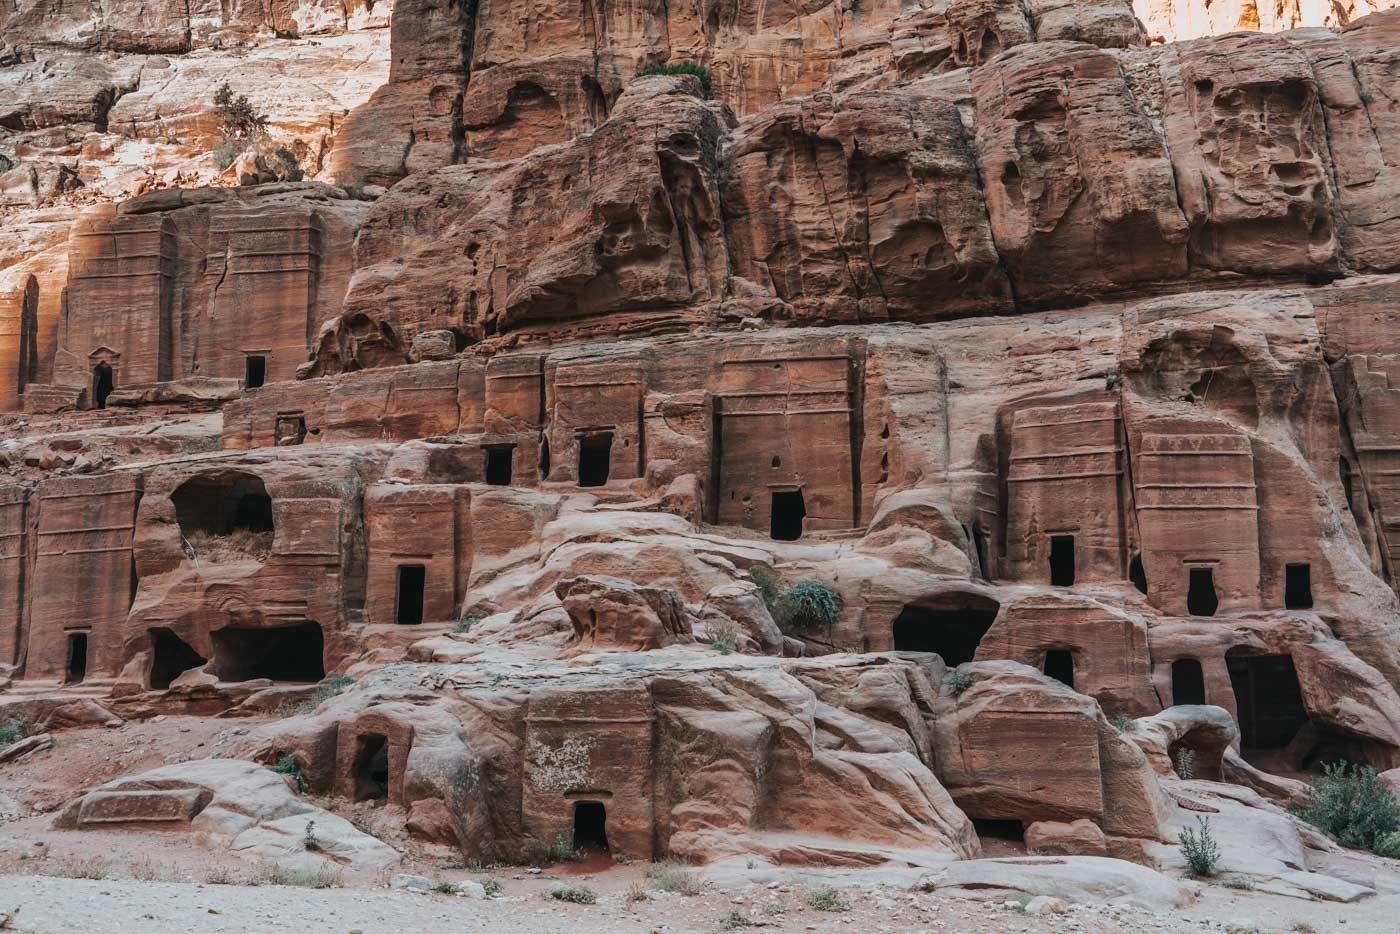 Rock-carved tombs along the main road in Petra, Jordan